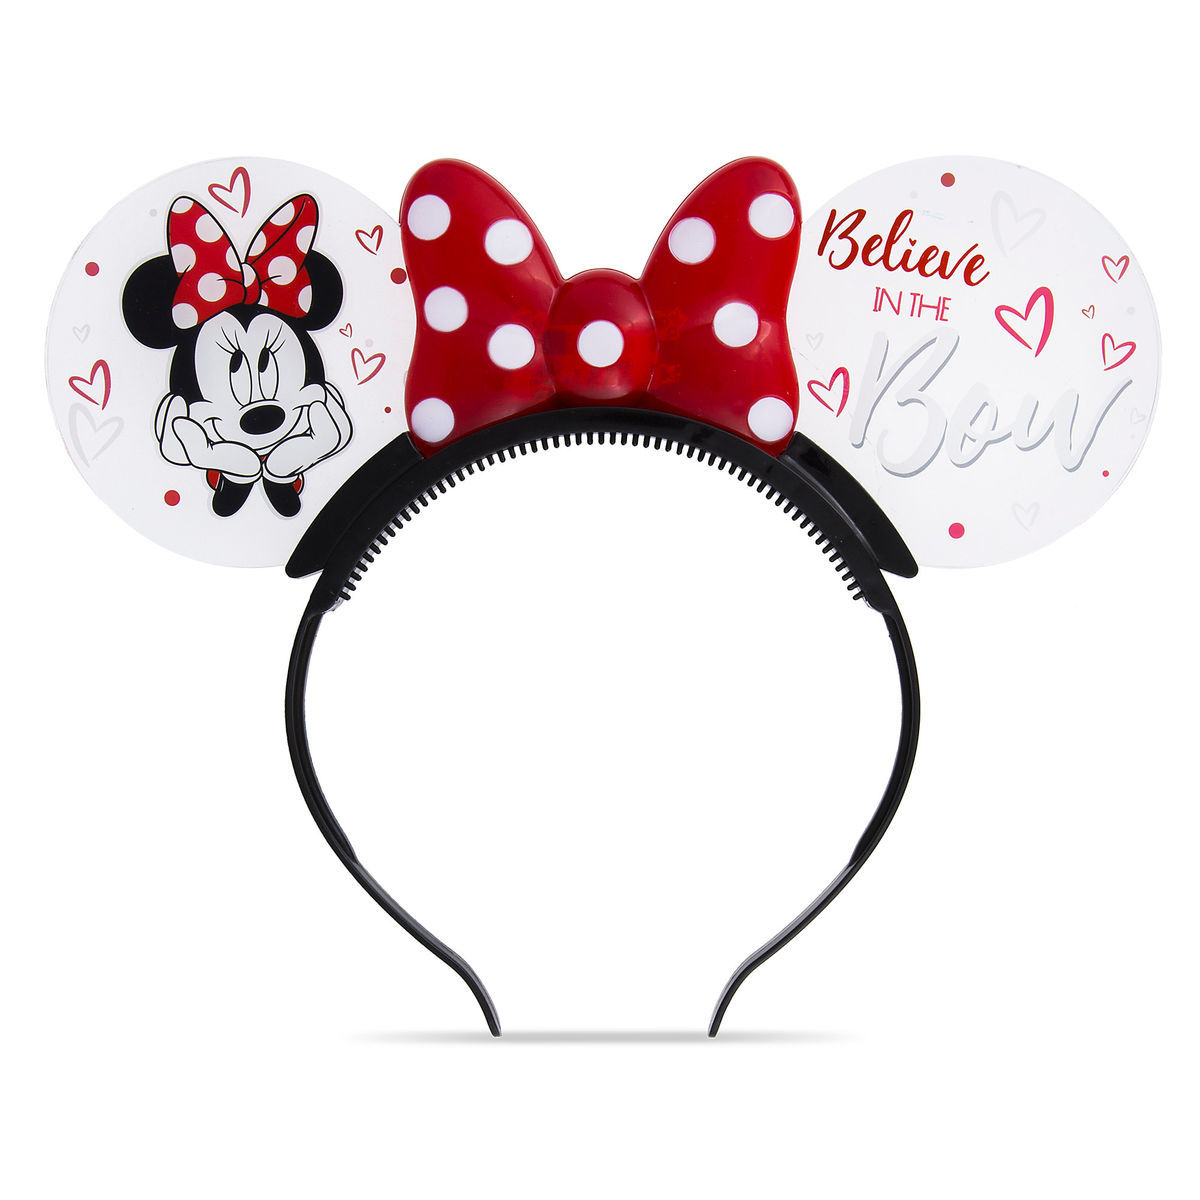 Minnie Mouse Light Up Ears Headband Shopdisney